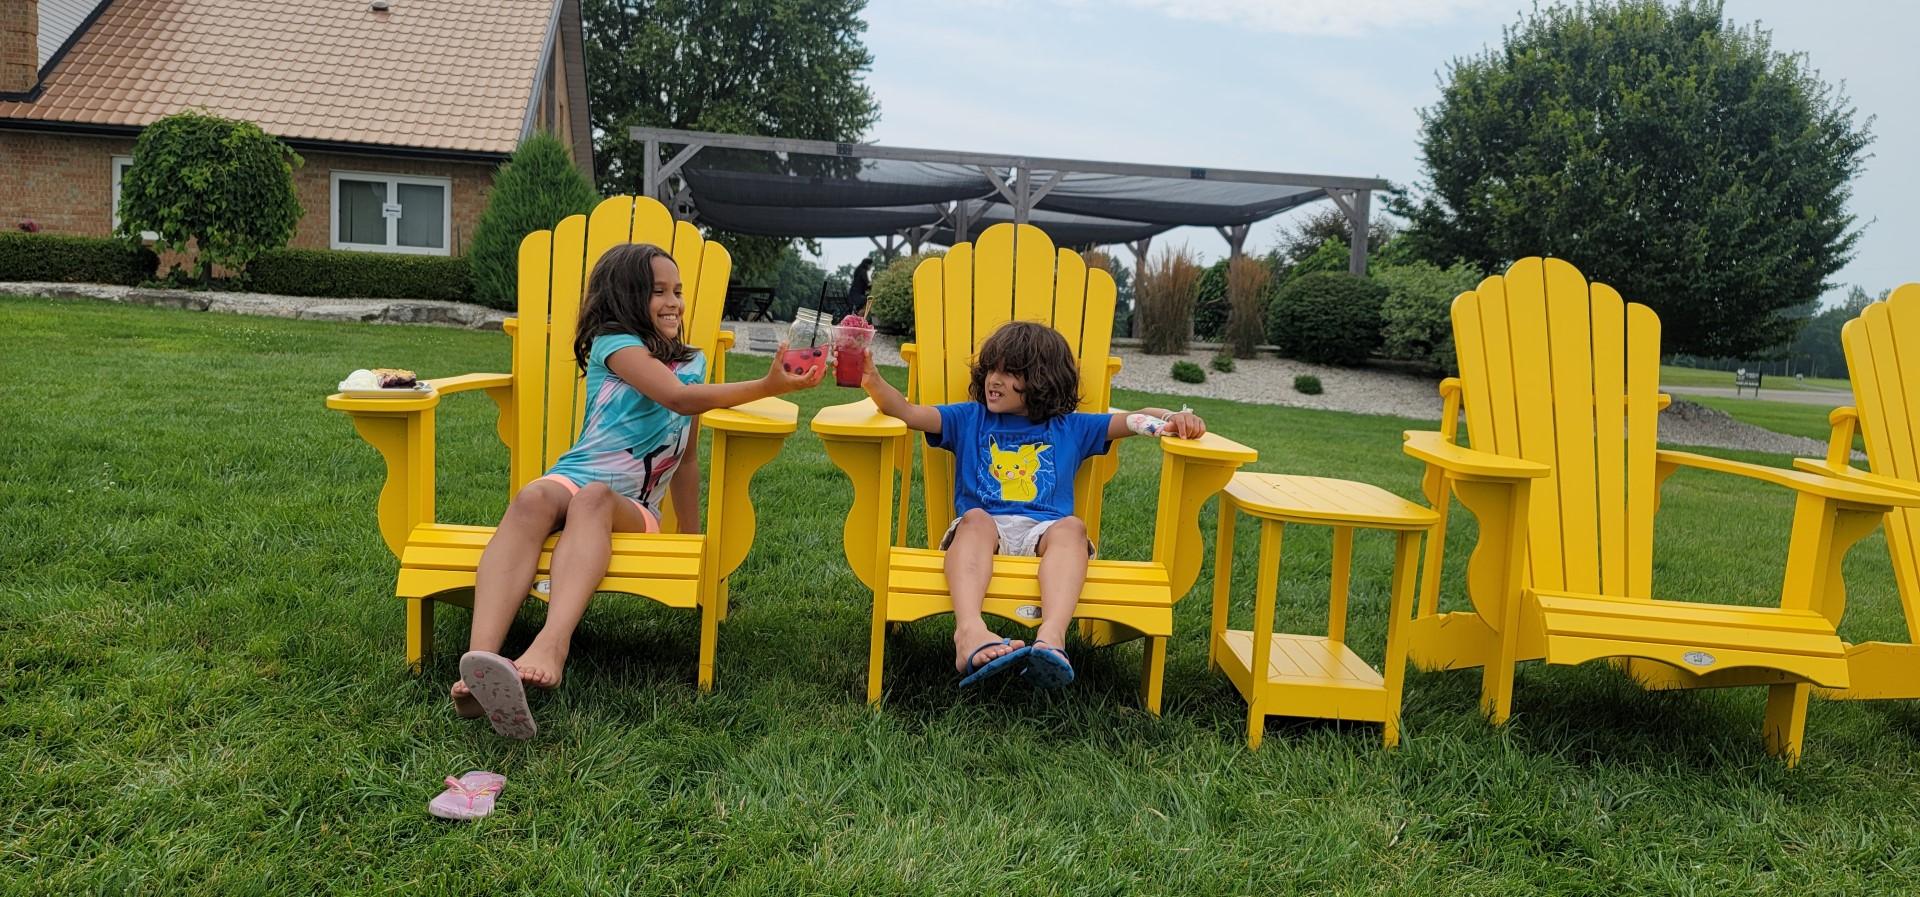 kids cheers with blueberry lemonade